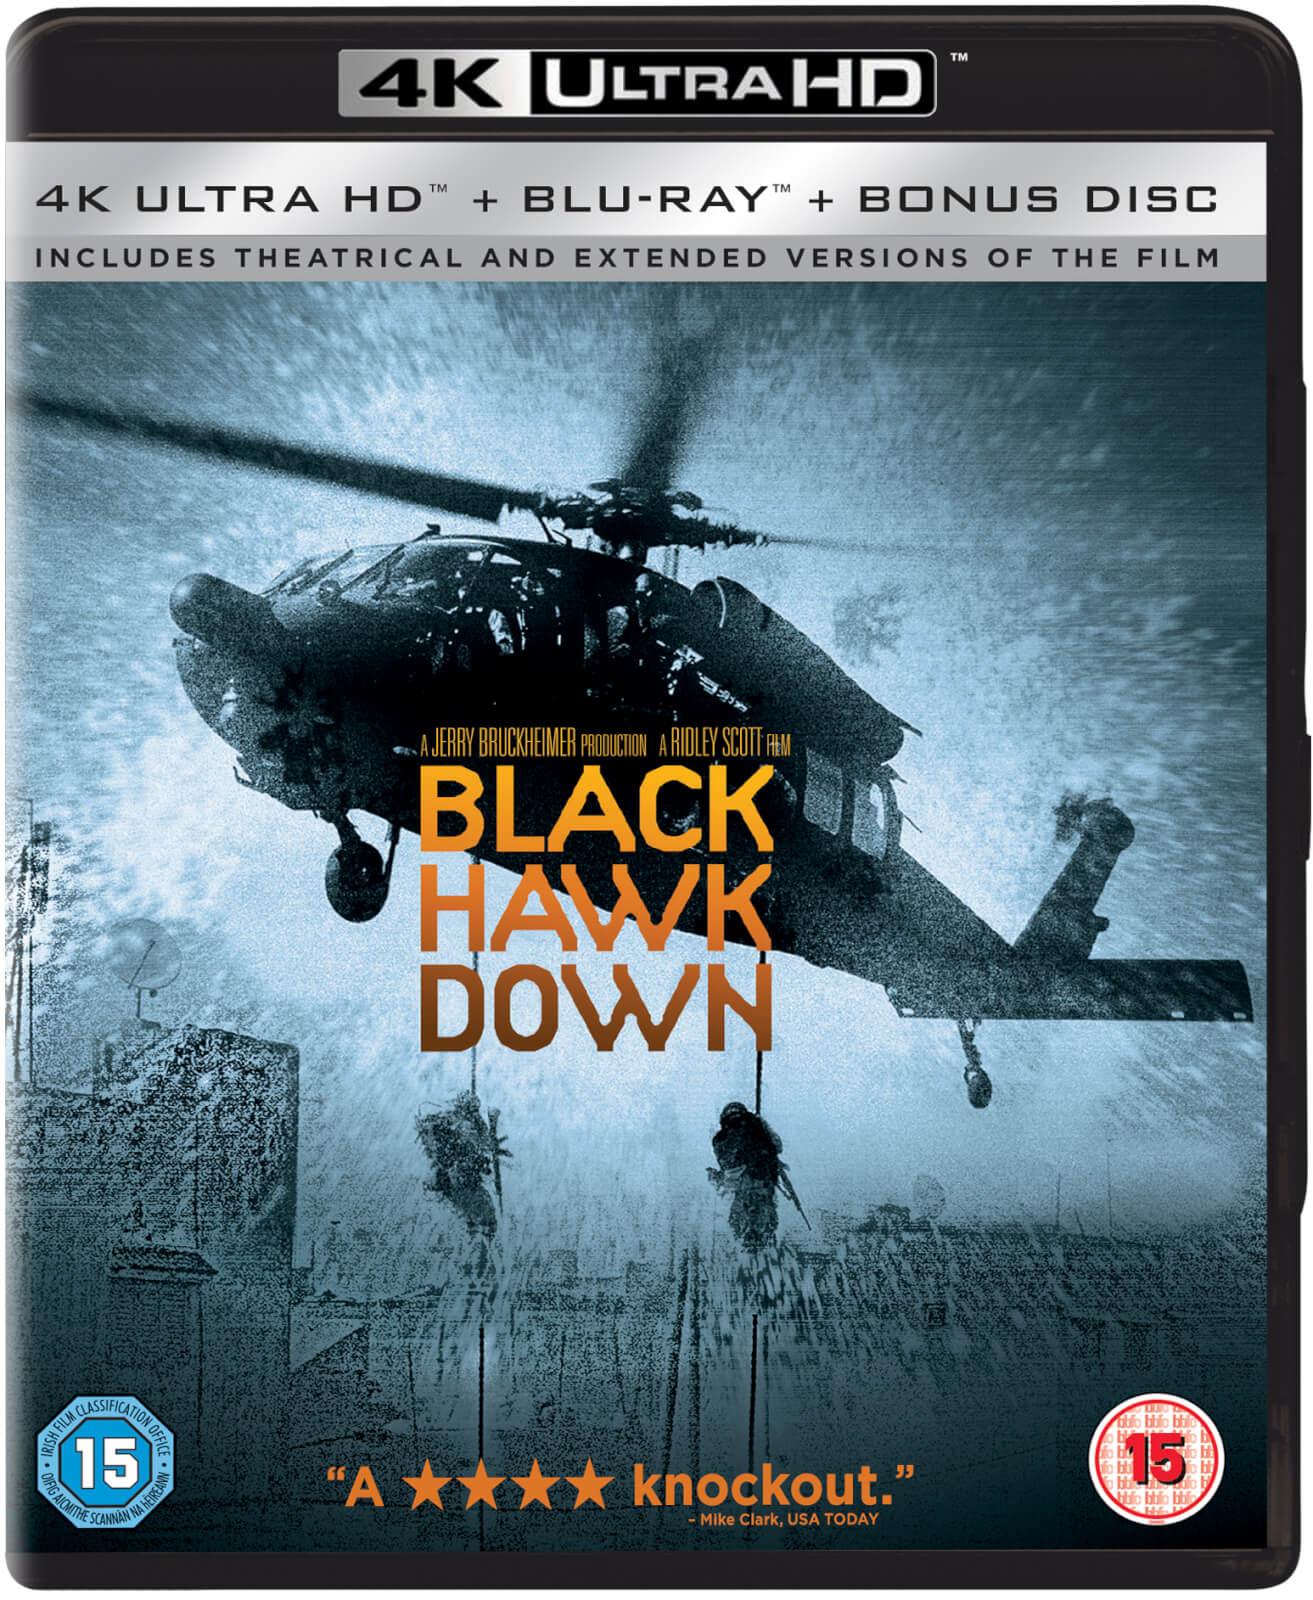 Blu-ray UHD 4K ° Blu-ray + Bonus - Black hawk down (La Chute du faucon noir)